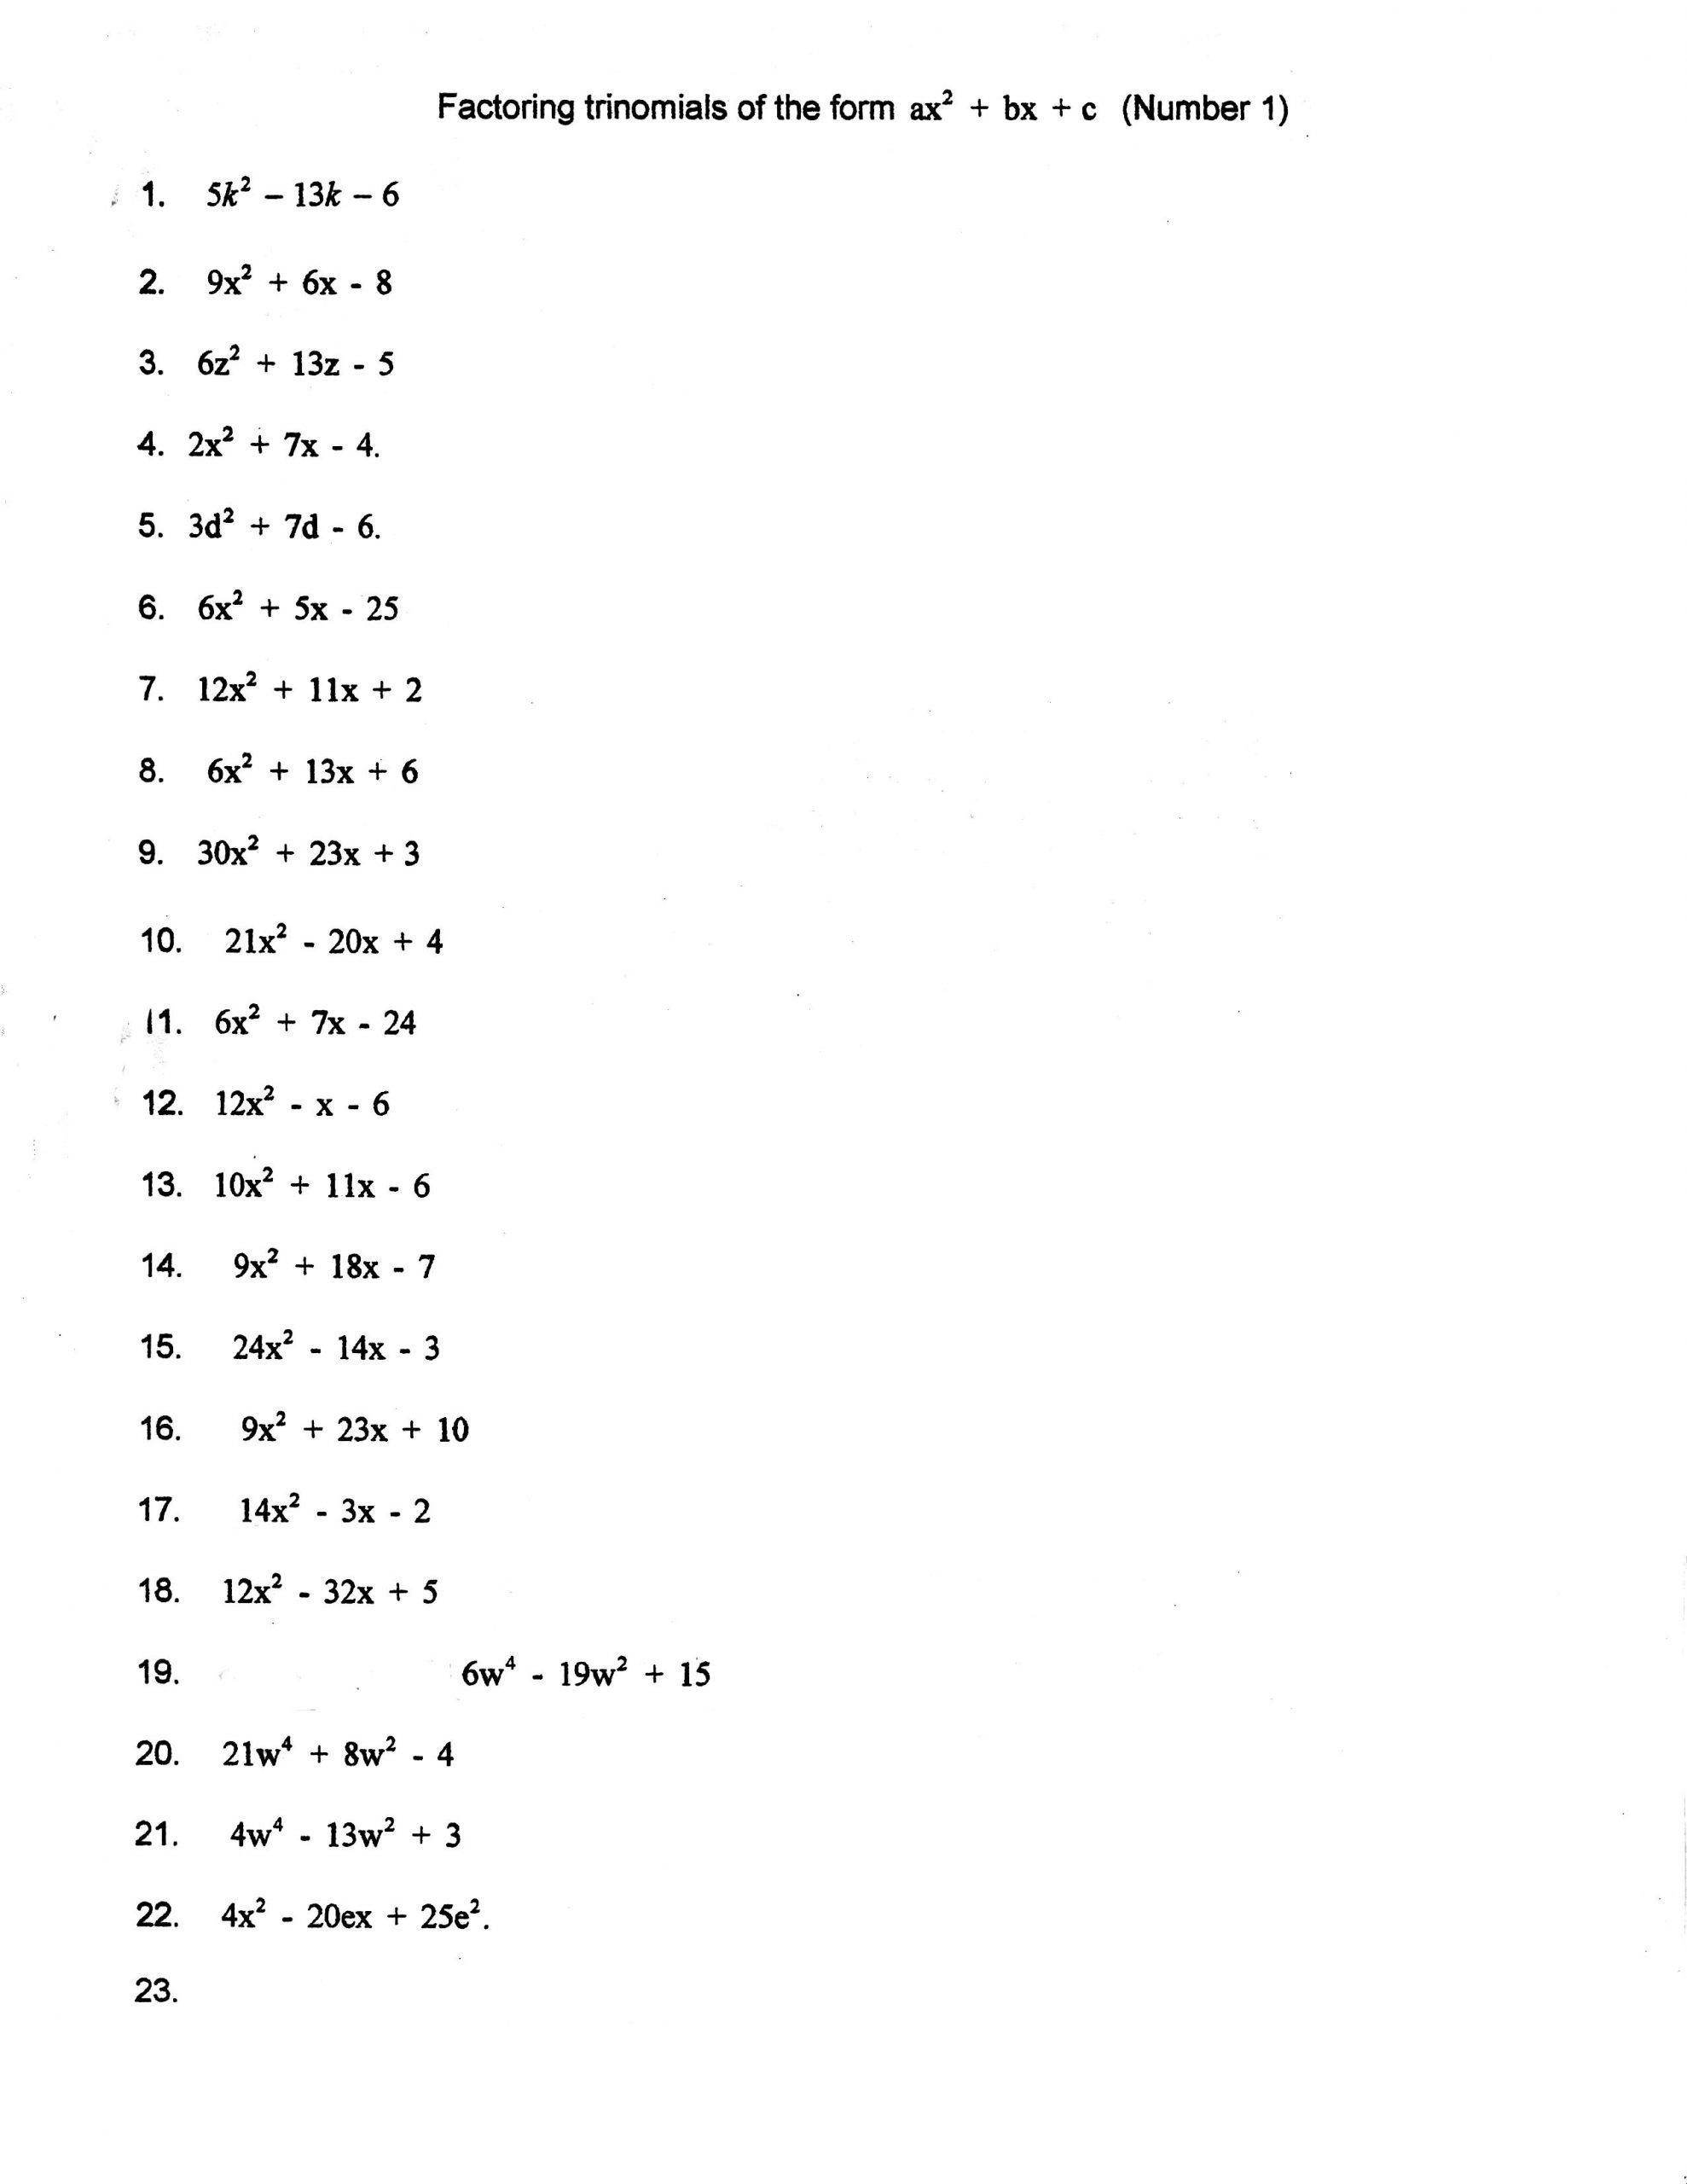 Factoring Trinomials Worksheet Answer Key Factoring Trinomials Trial and Error Worksheet